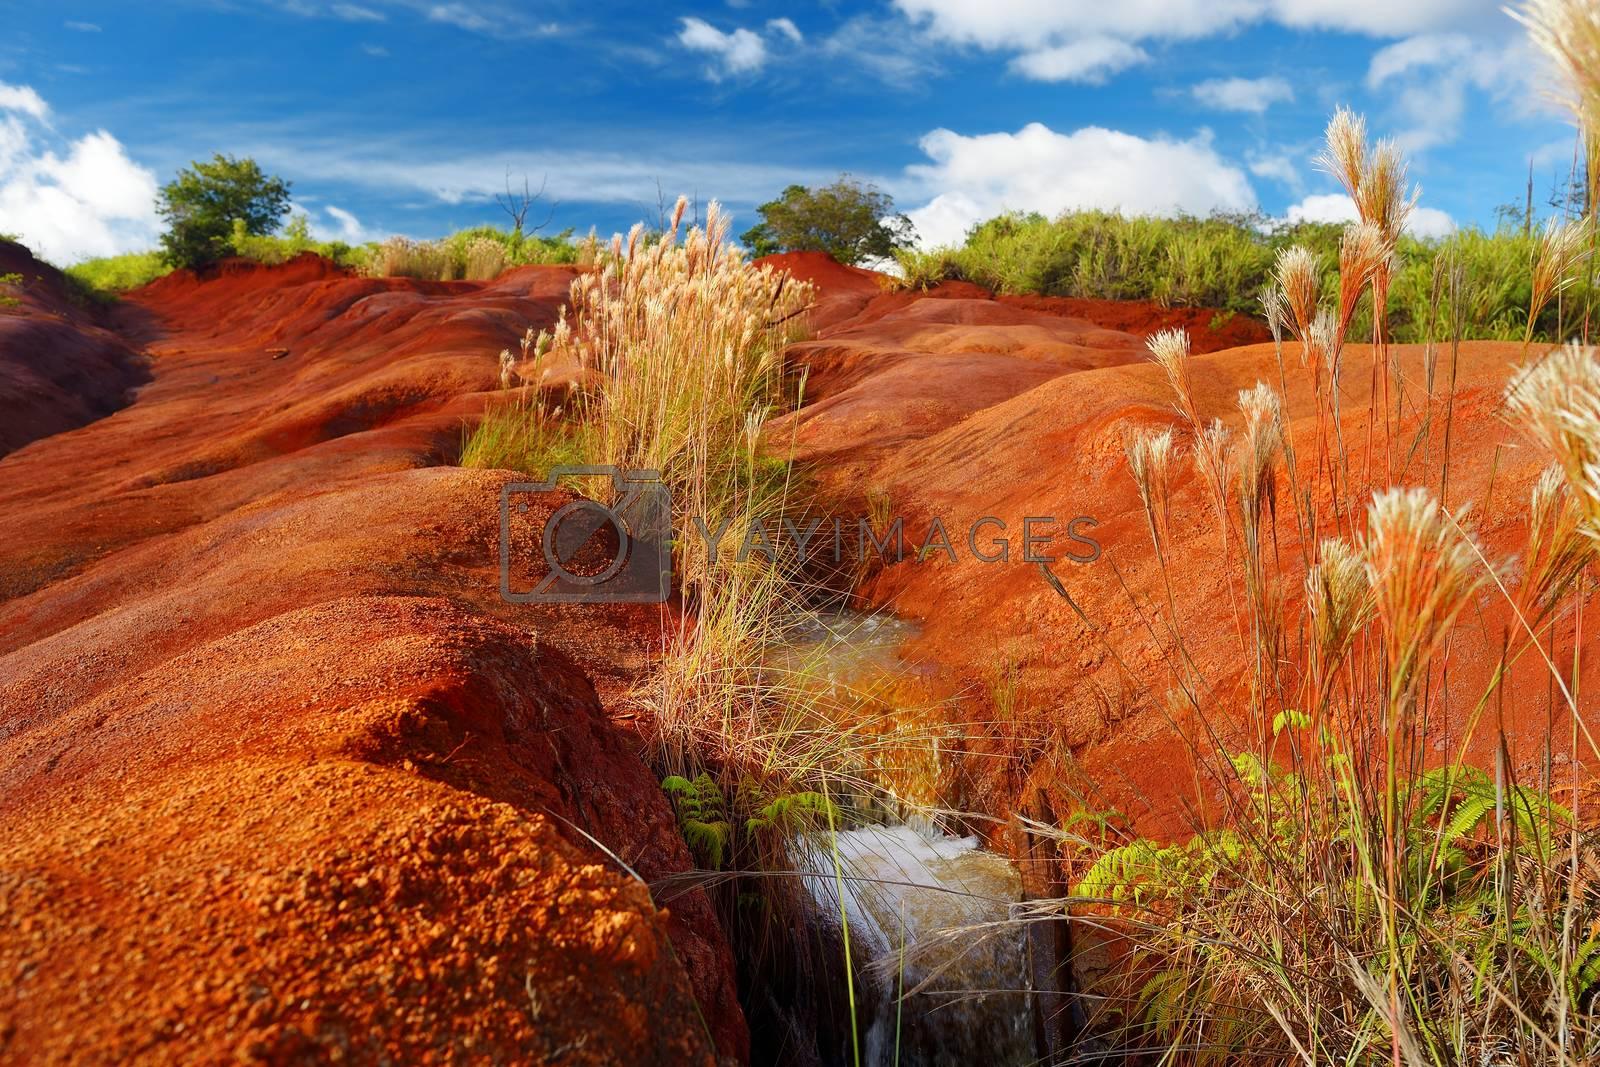 Famous red dirt of Waimea Canyon in Kauai, Hawaii